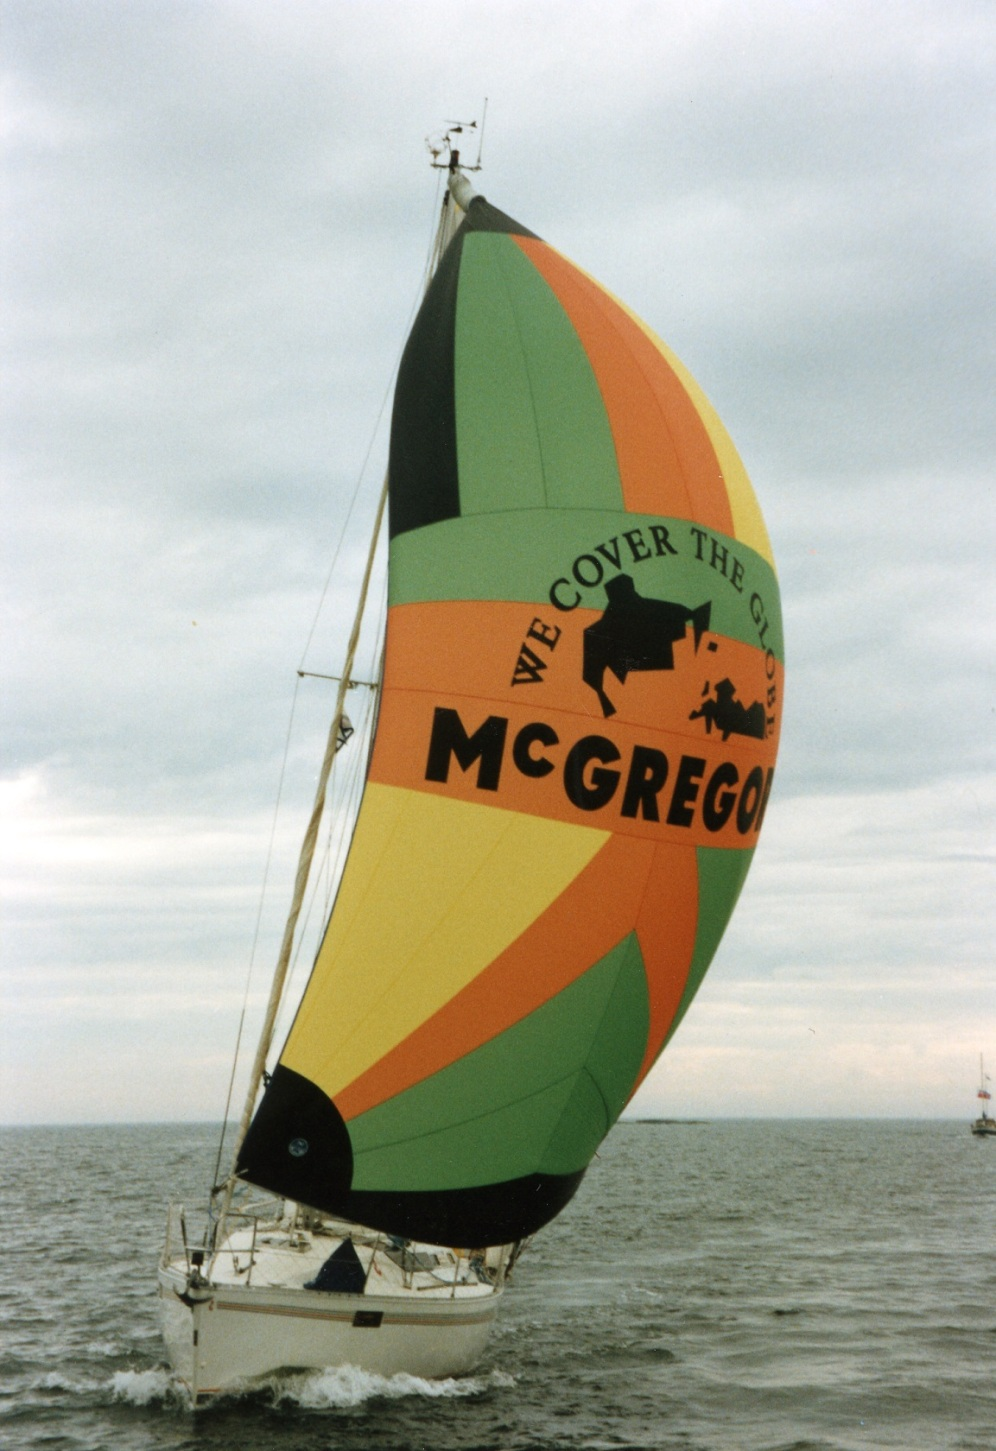 mc gregor spinnu vetää